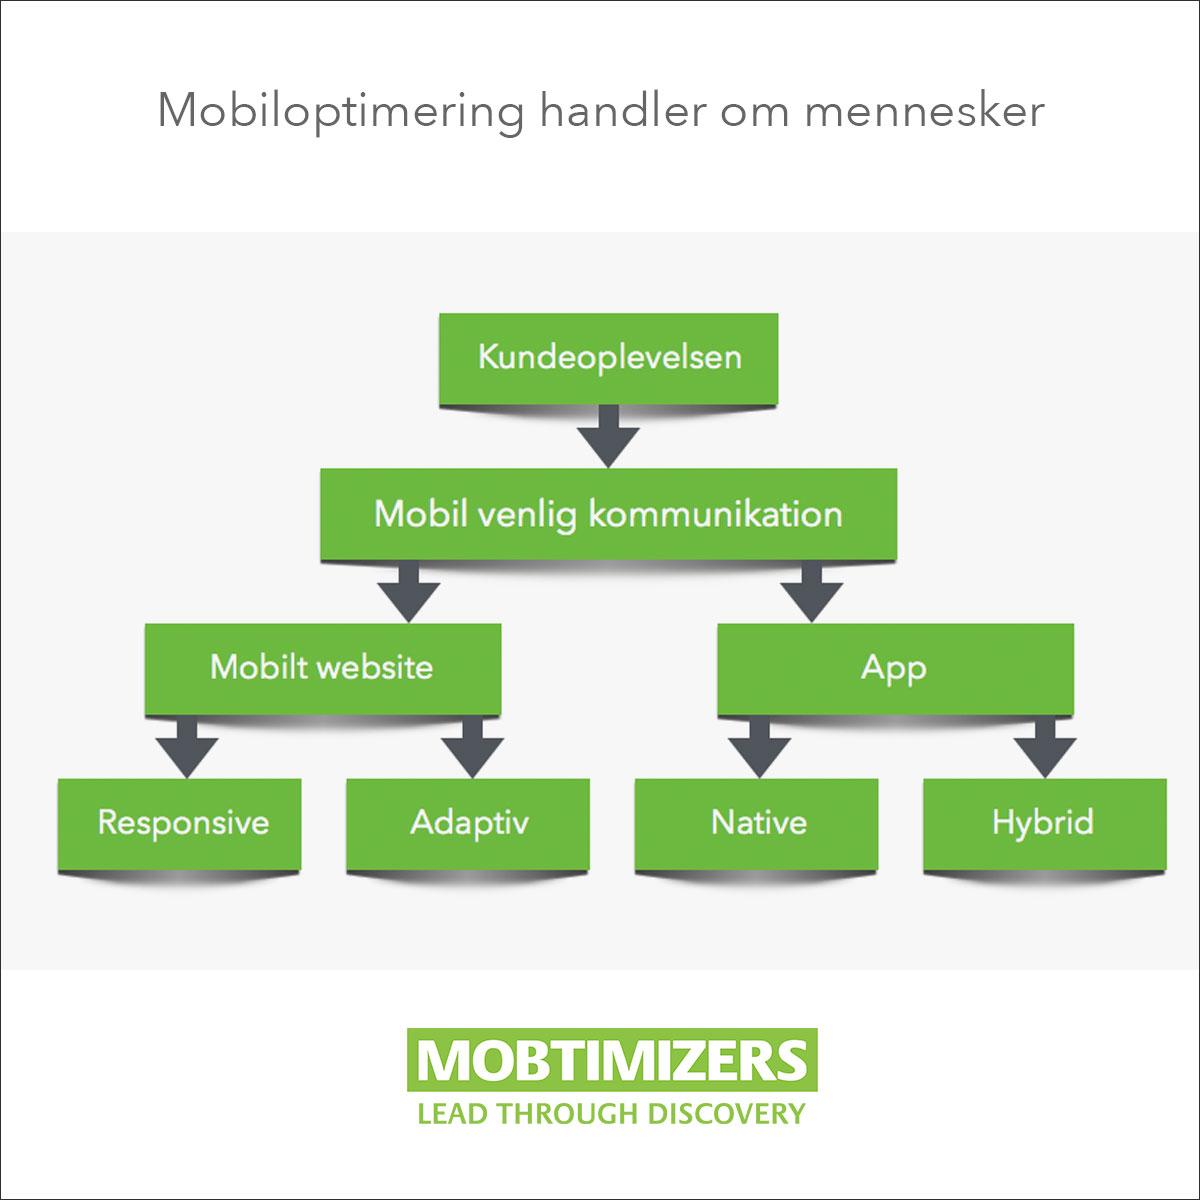 Mobiloptimering Handler Om Mennesker - Responsive vs. Adaptiv vs. Native vs. Hybrid -